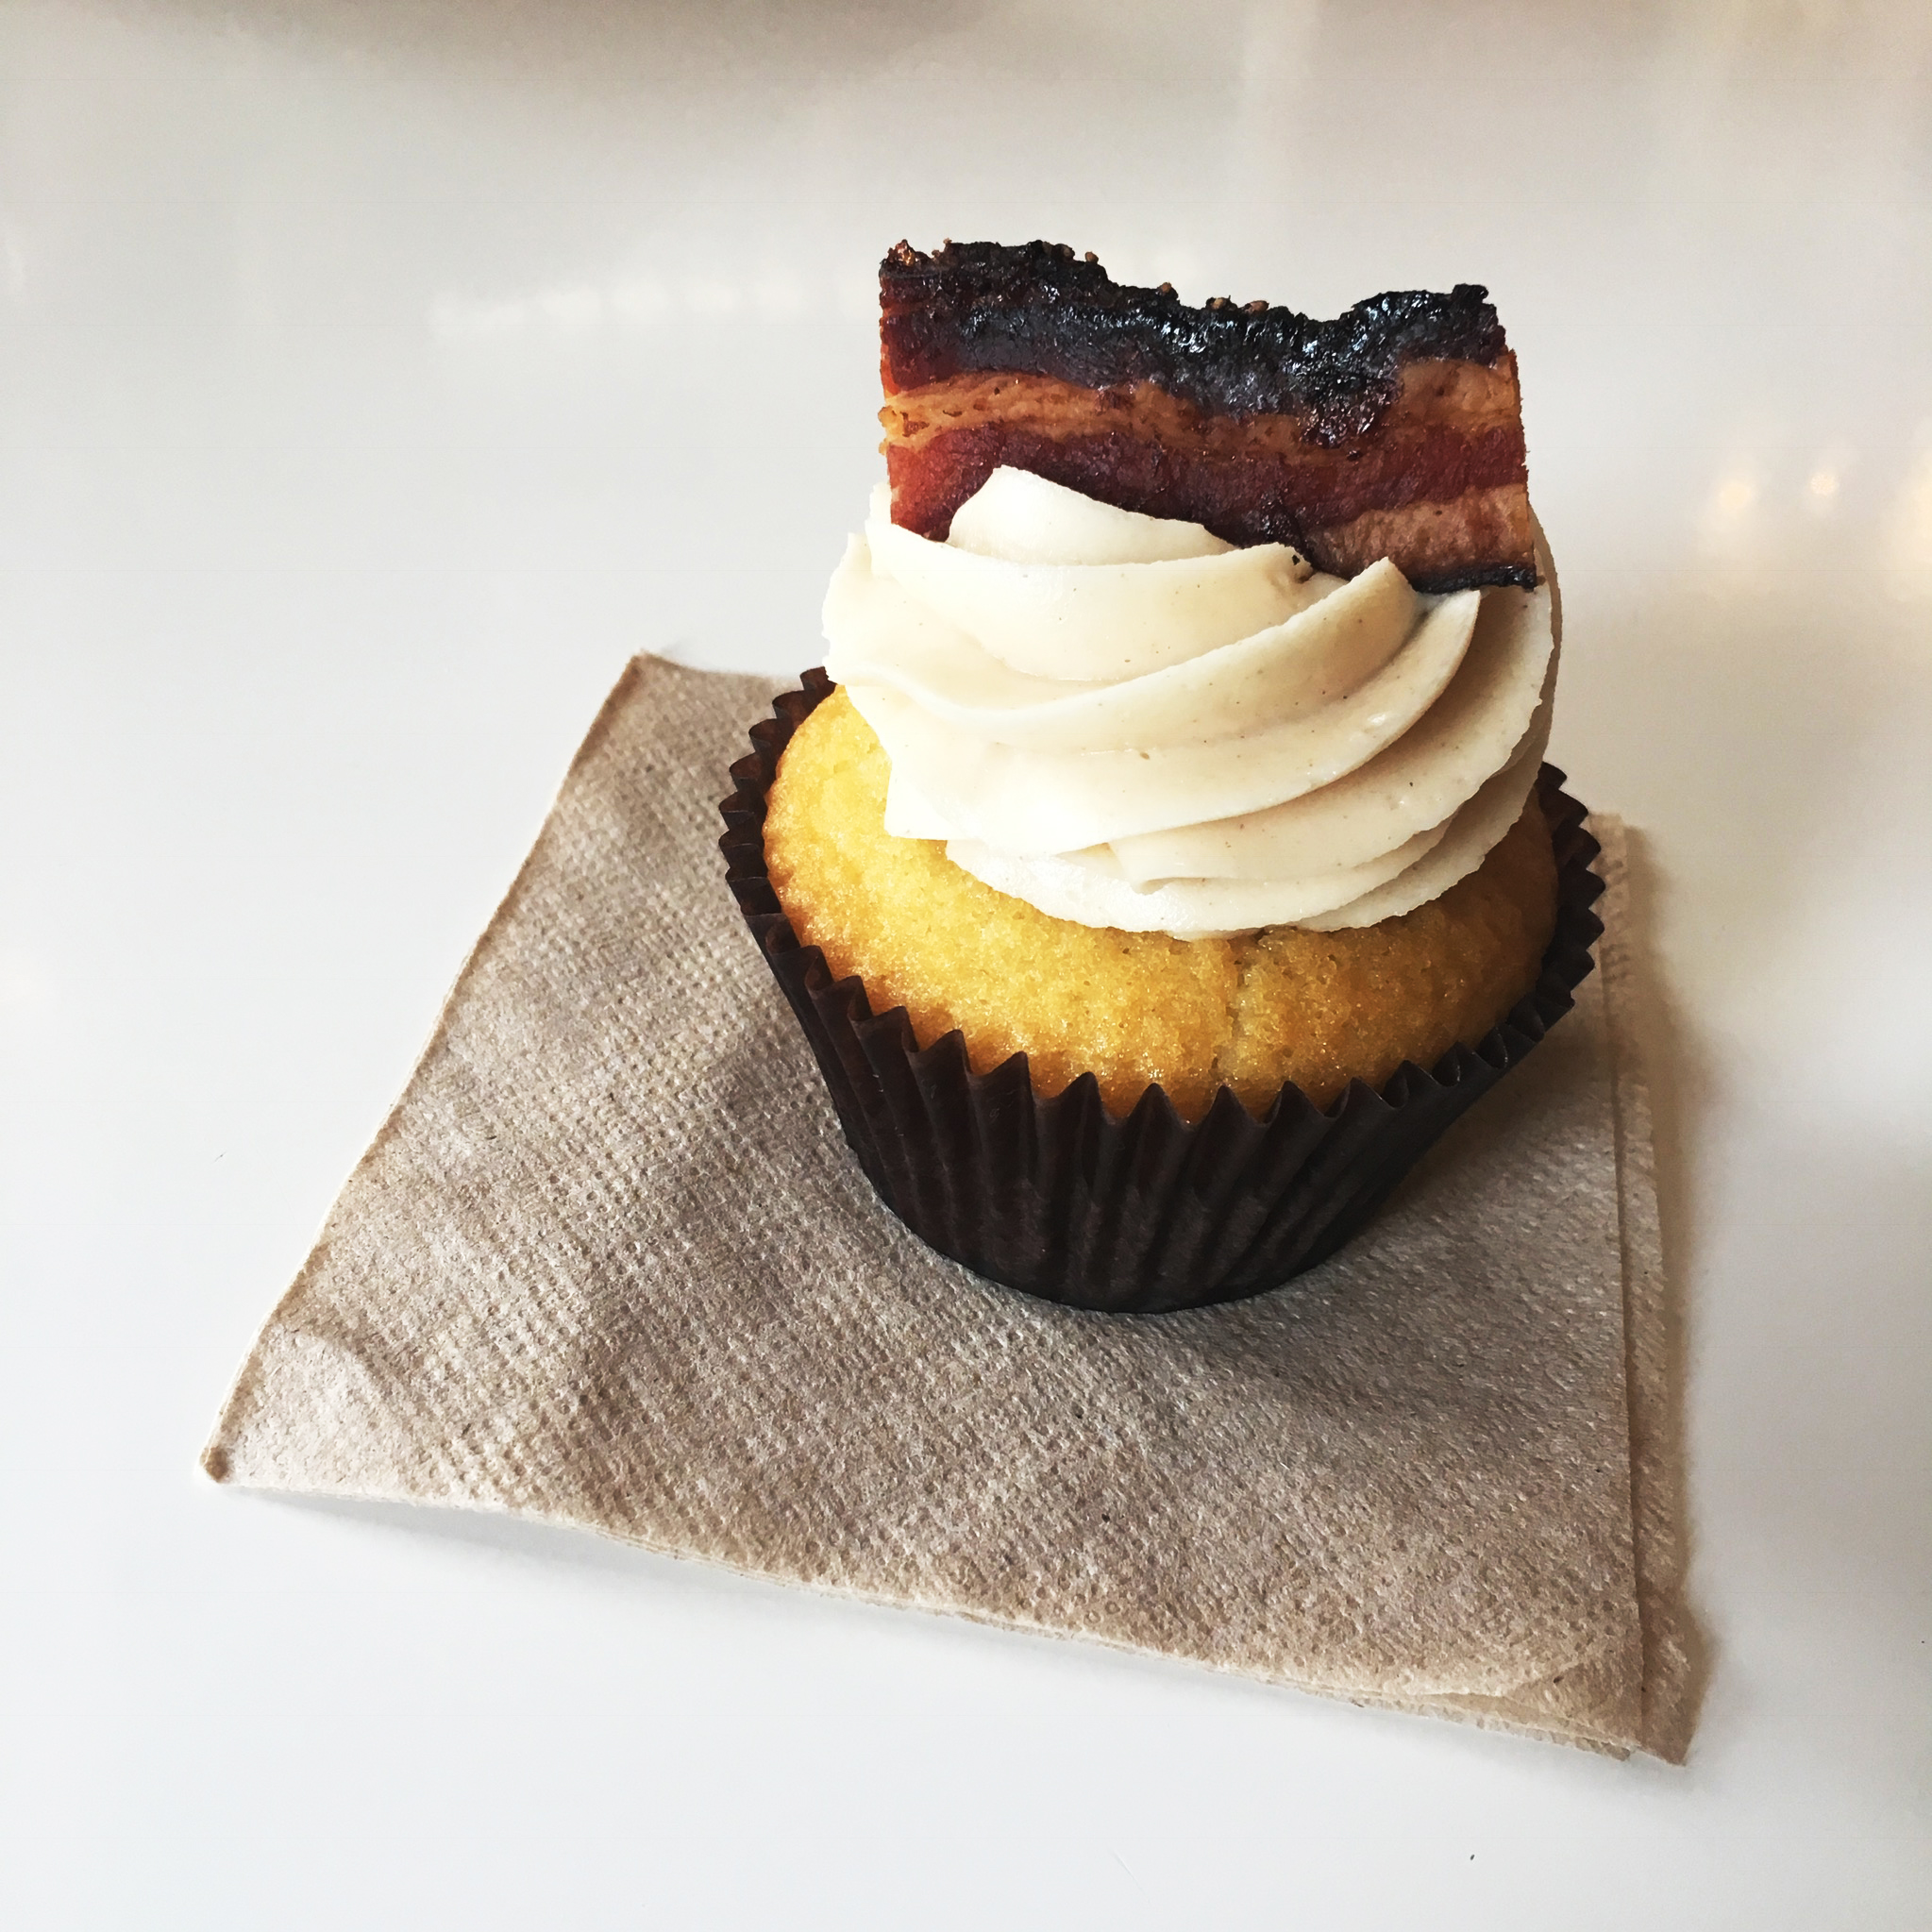 Moustache Cupcakes Healdsburg CA